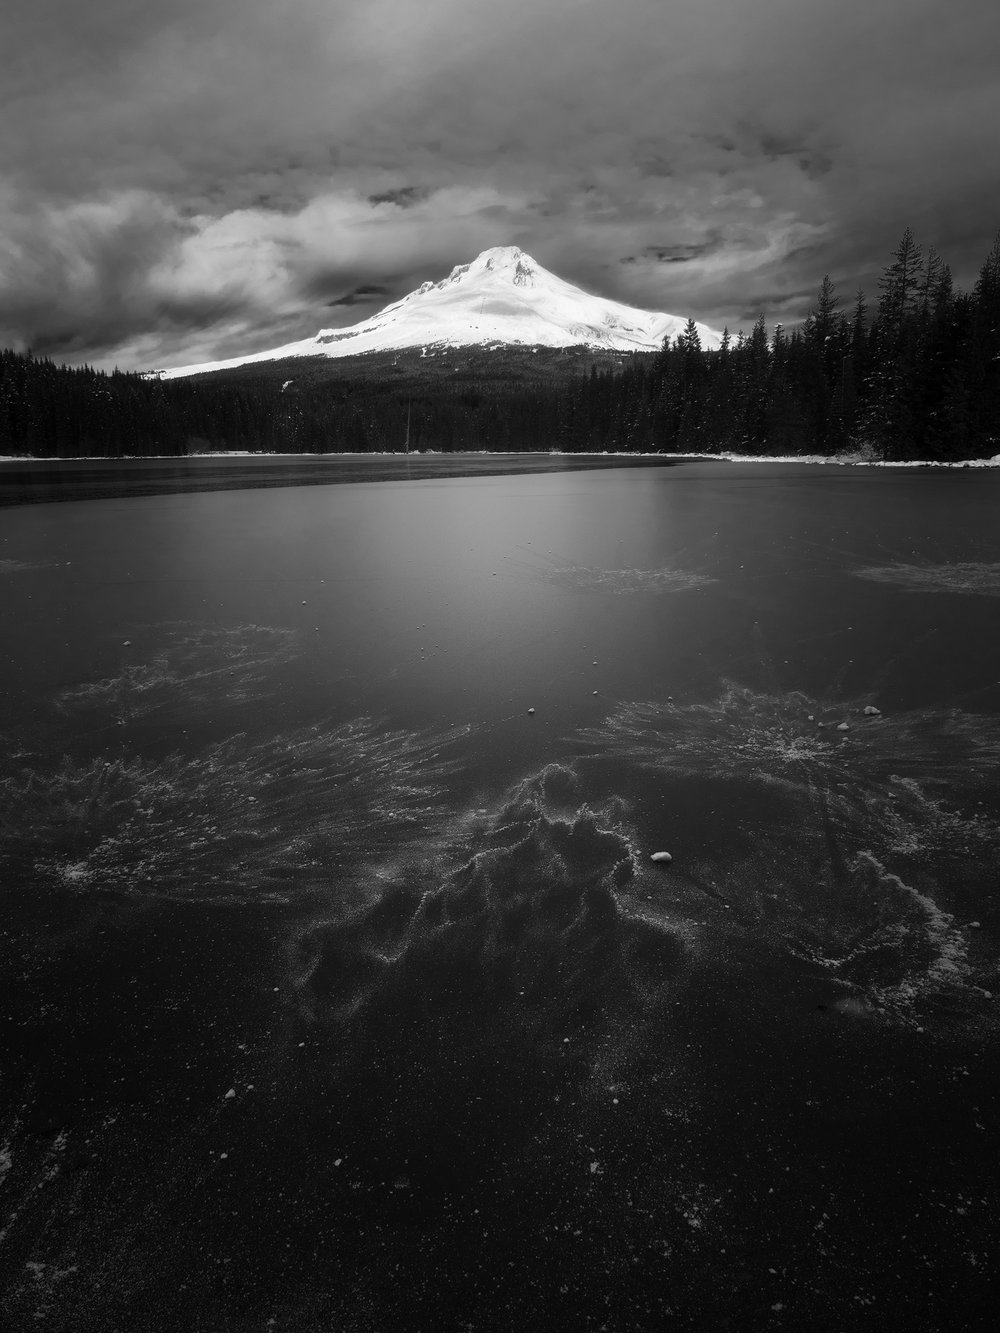 Mt. Hood BnW.jpg